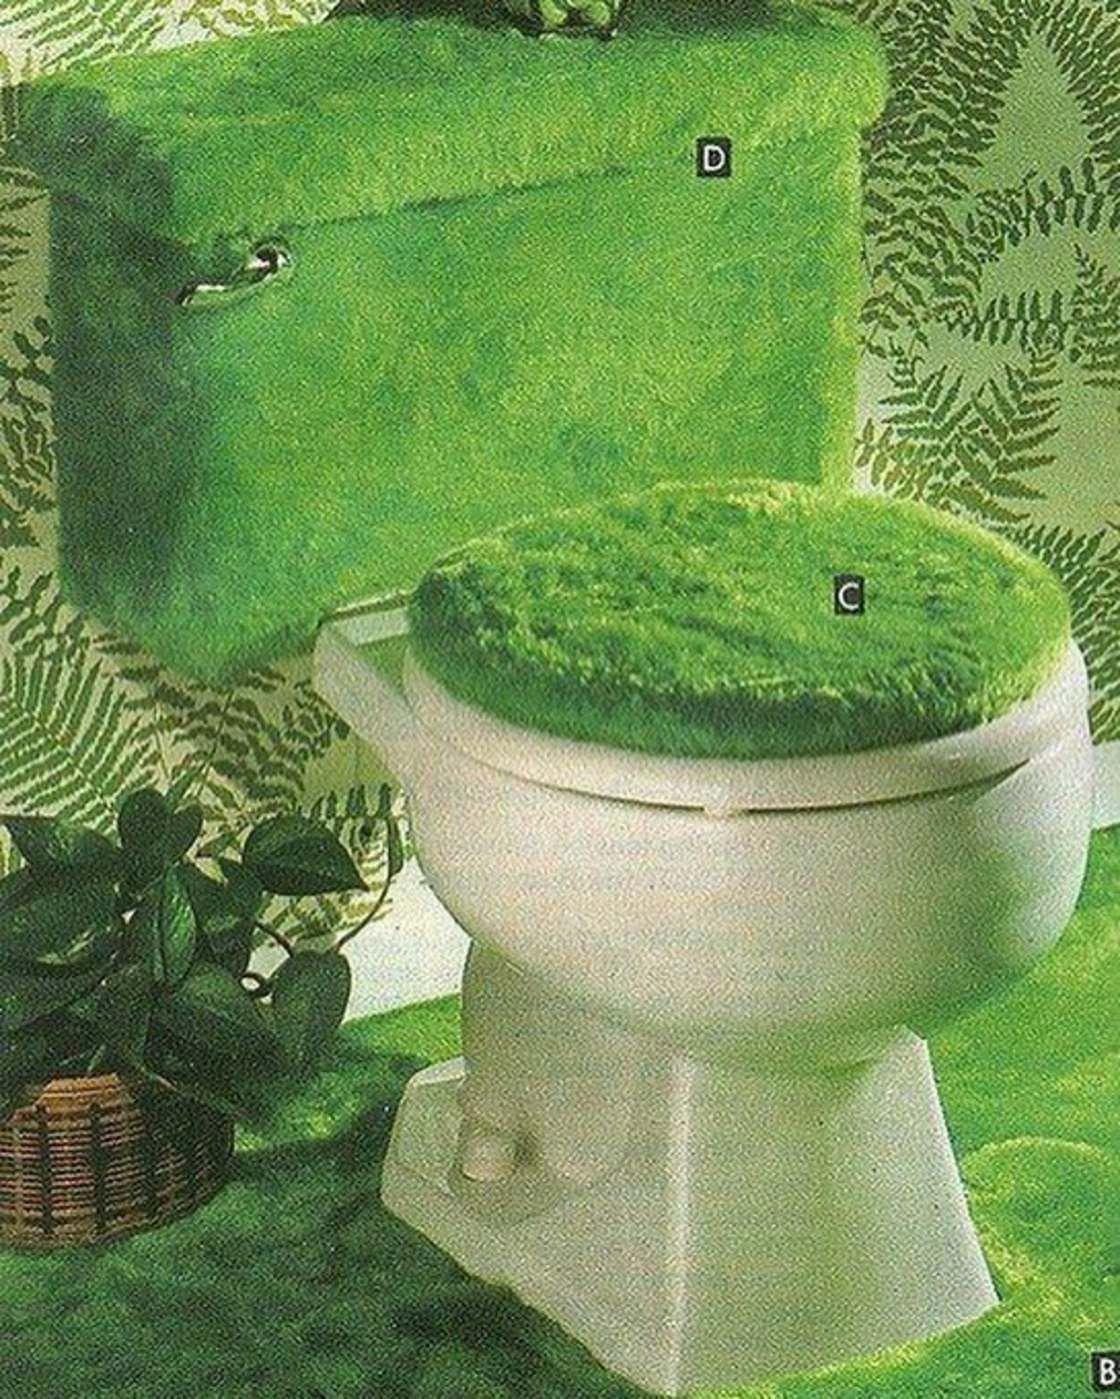 World S Most Amazing Bathroom From Mr Modtomic Kitsch Savethepinkbathrooms Retro Room Kitschy Vintage Room